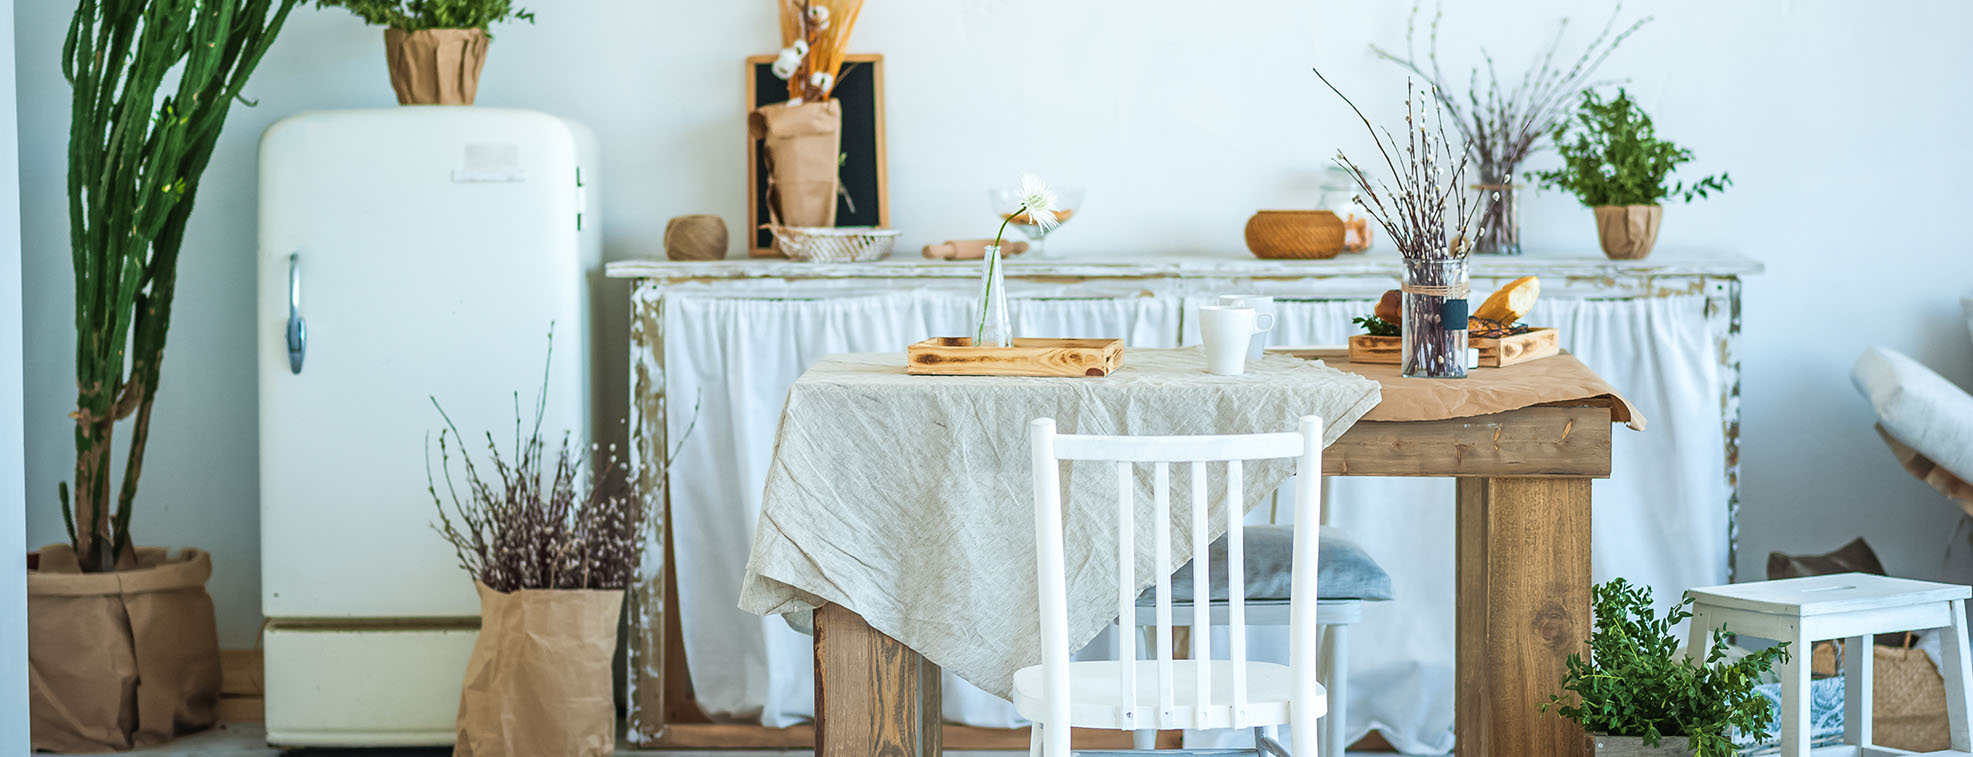 Shabby Chic Modern Interior Design Styles